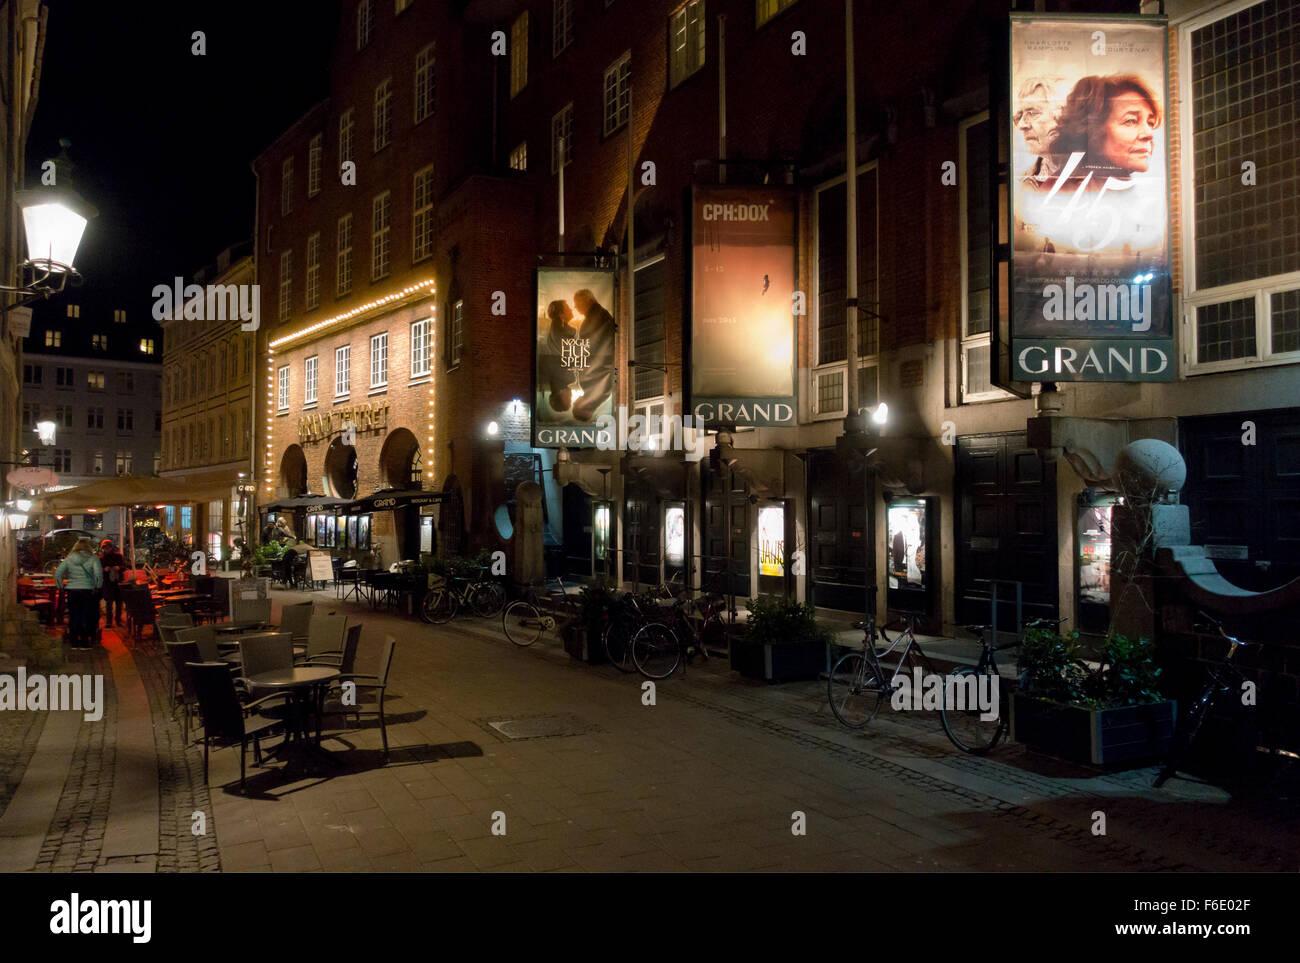 Outdoor Movie Theatre Stock Photos & Outdoor Movie Theatre Stock ...